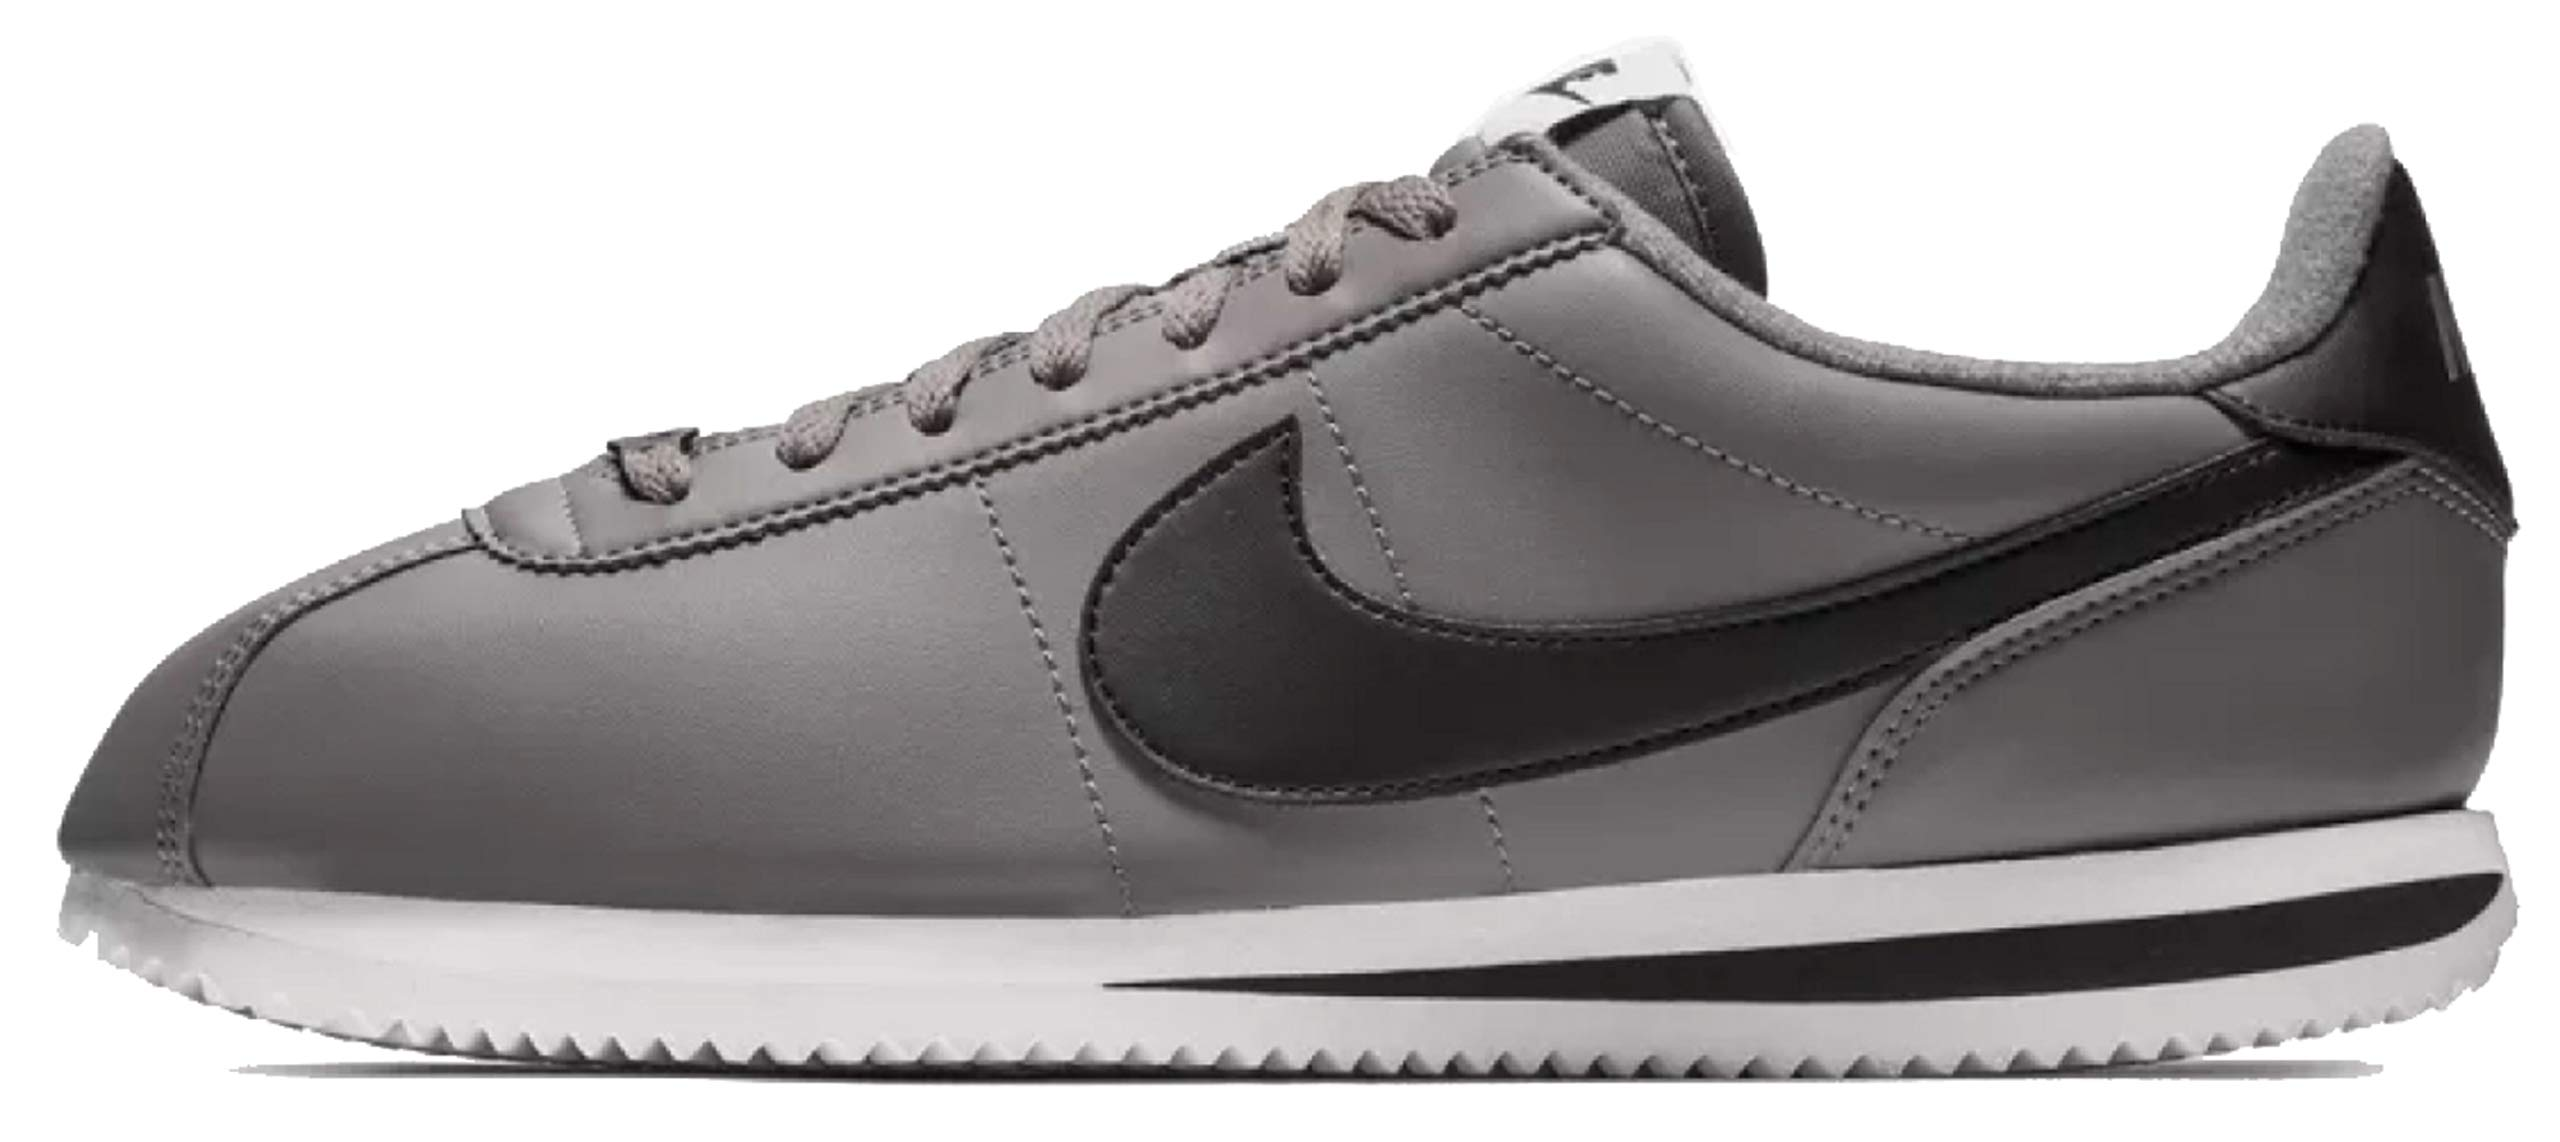 buy online bddb6 11766 Galleon - Nike 819719-004  Cortez Basic Leather Gunsmoke Black White  Sneakers (10.5 D(M) US Men)